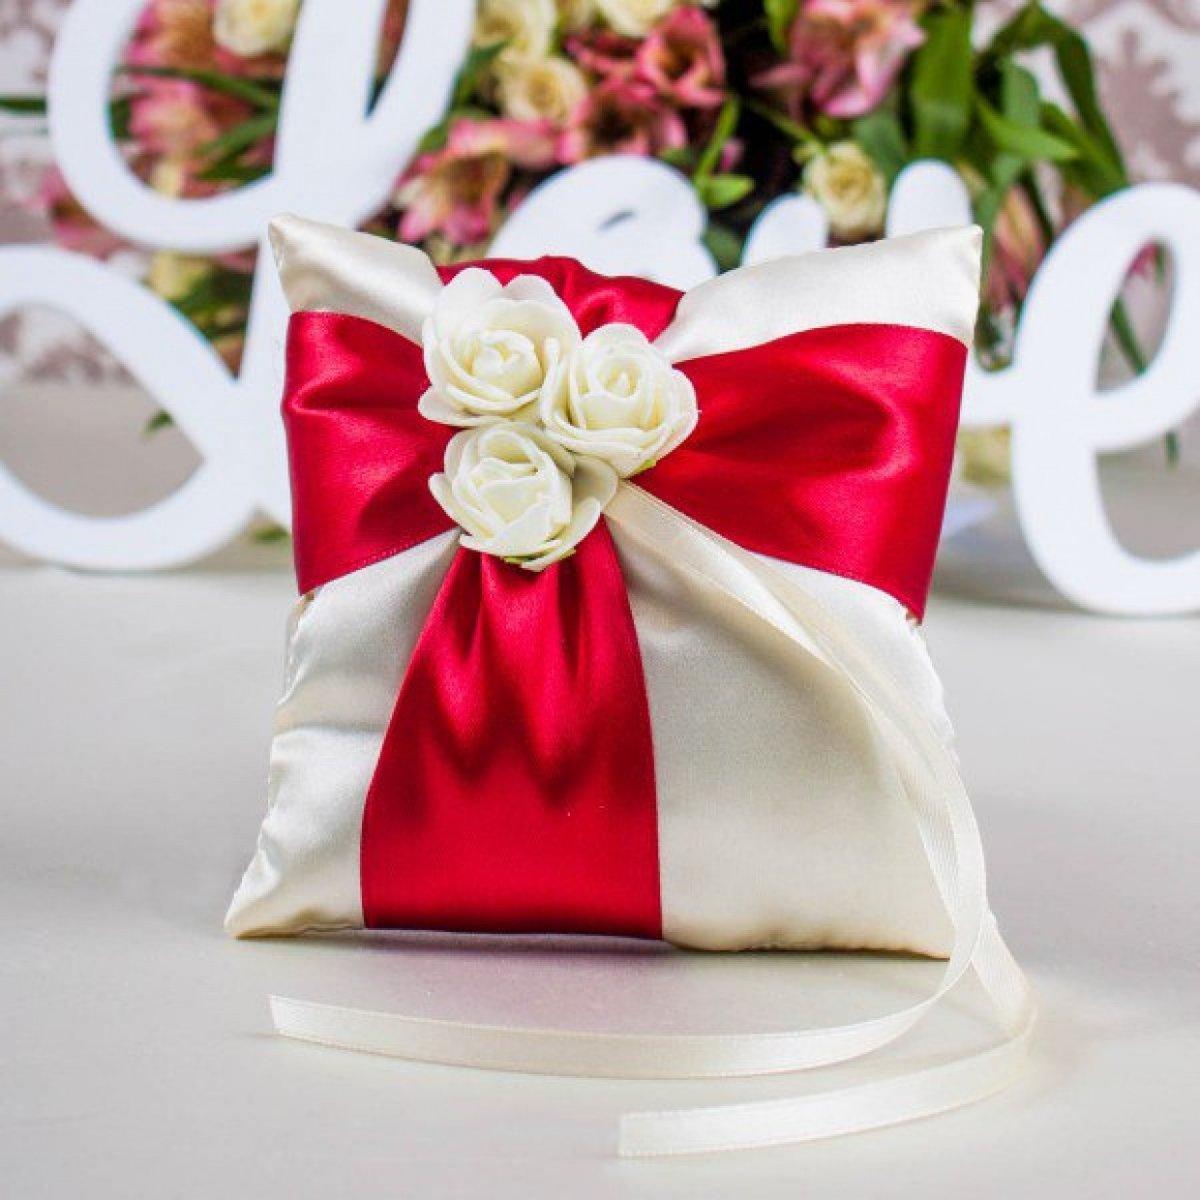 подушечки для колец на свадьбу фото время